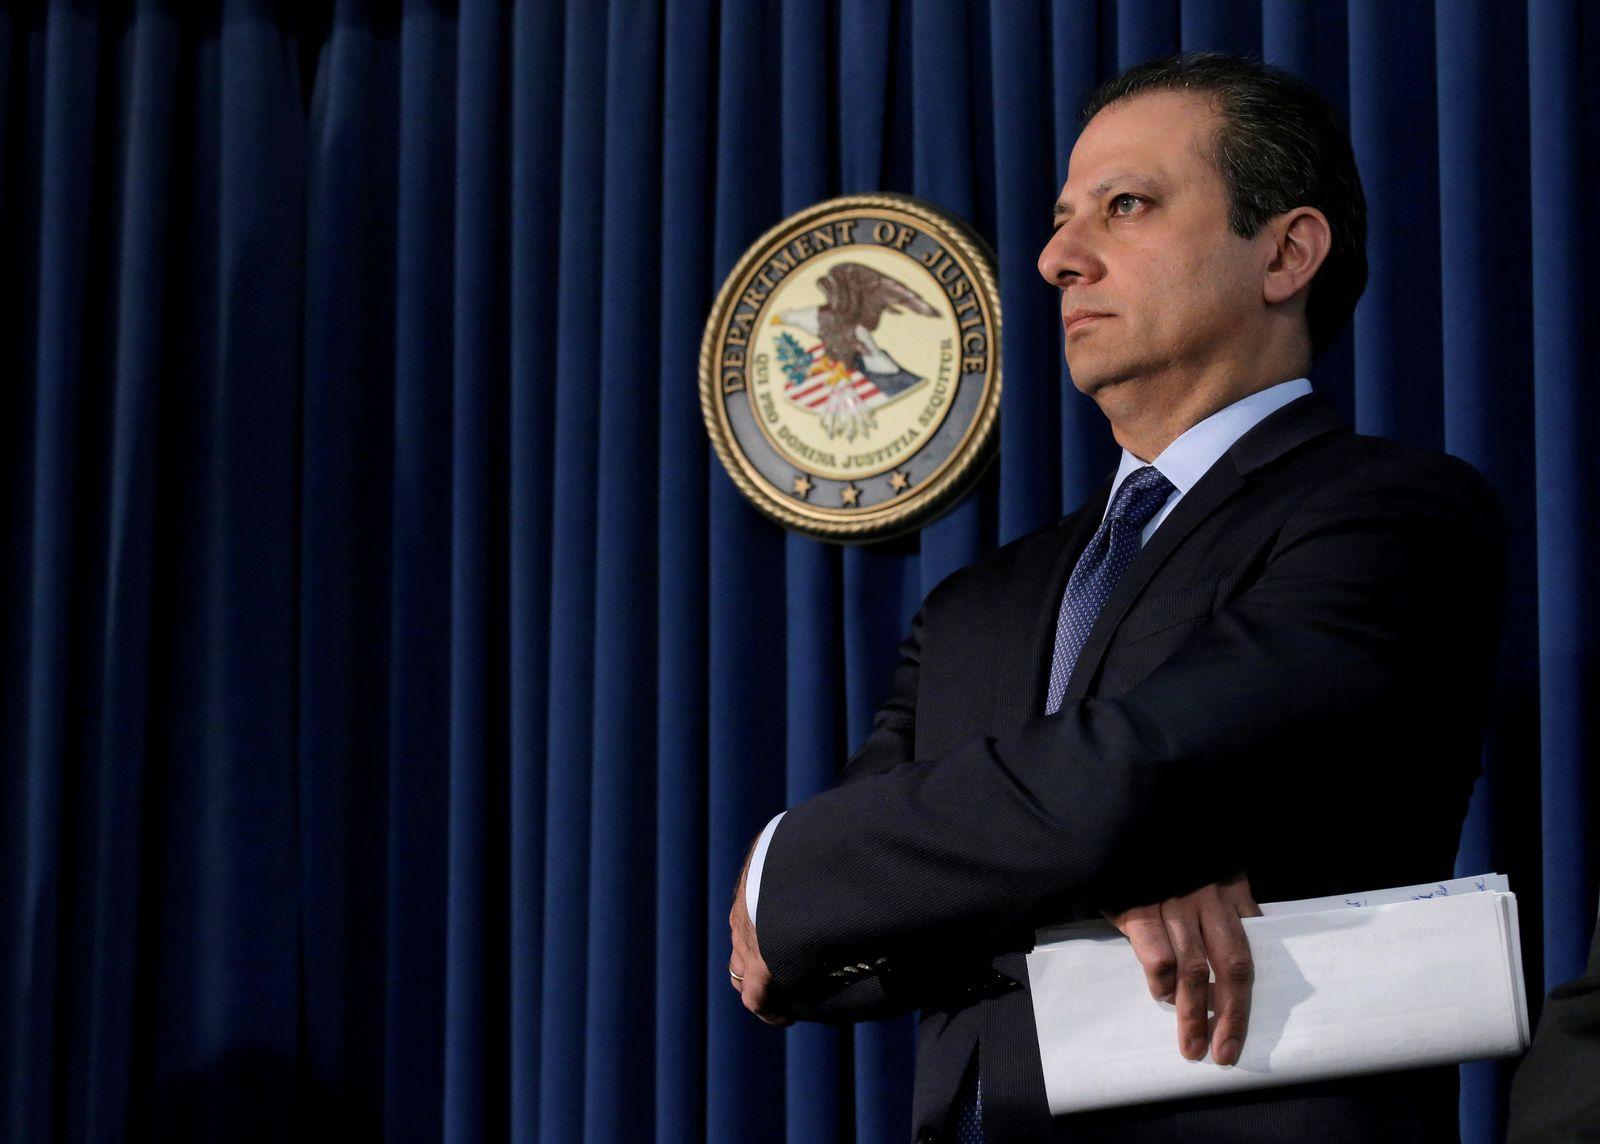 USA-TRUMP/JUSTICE-PROSECUTORS